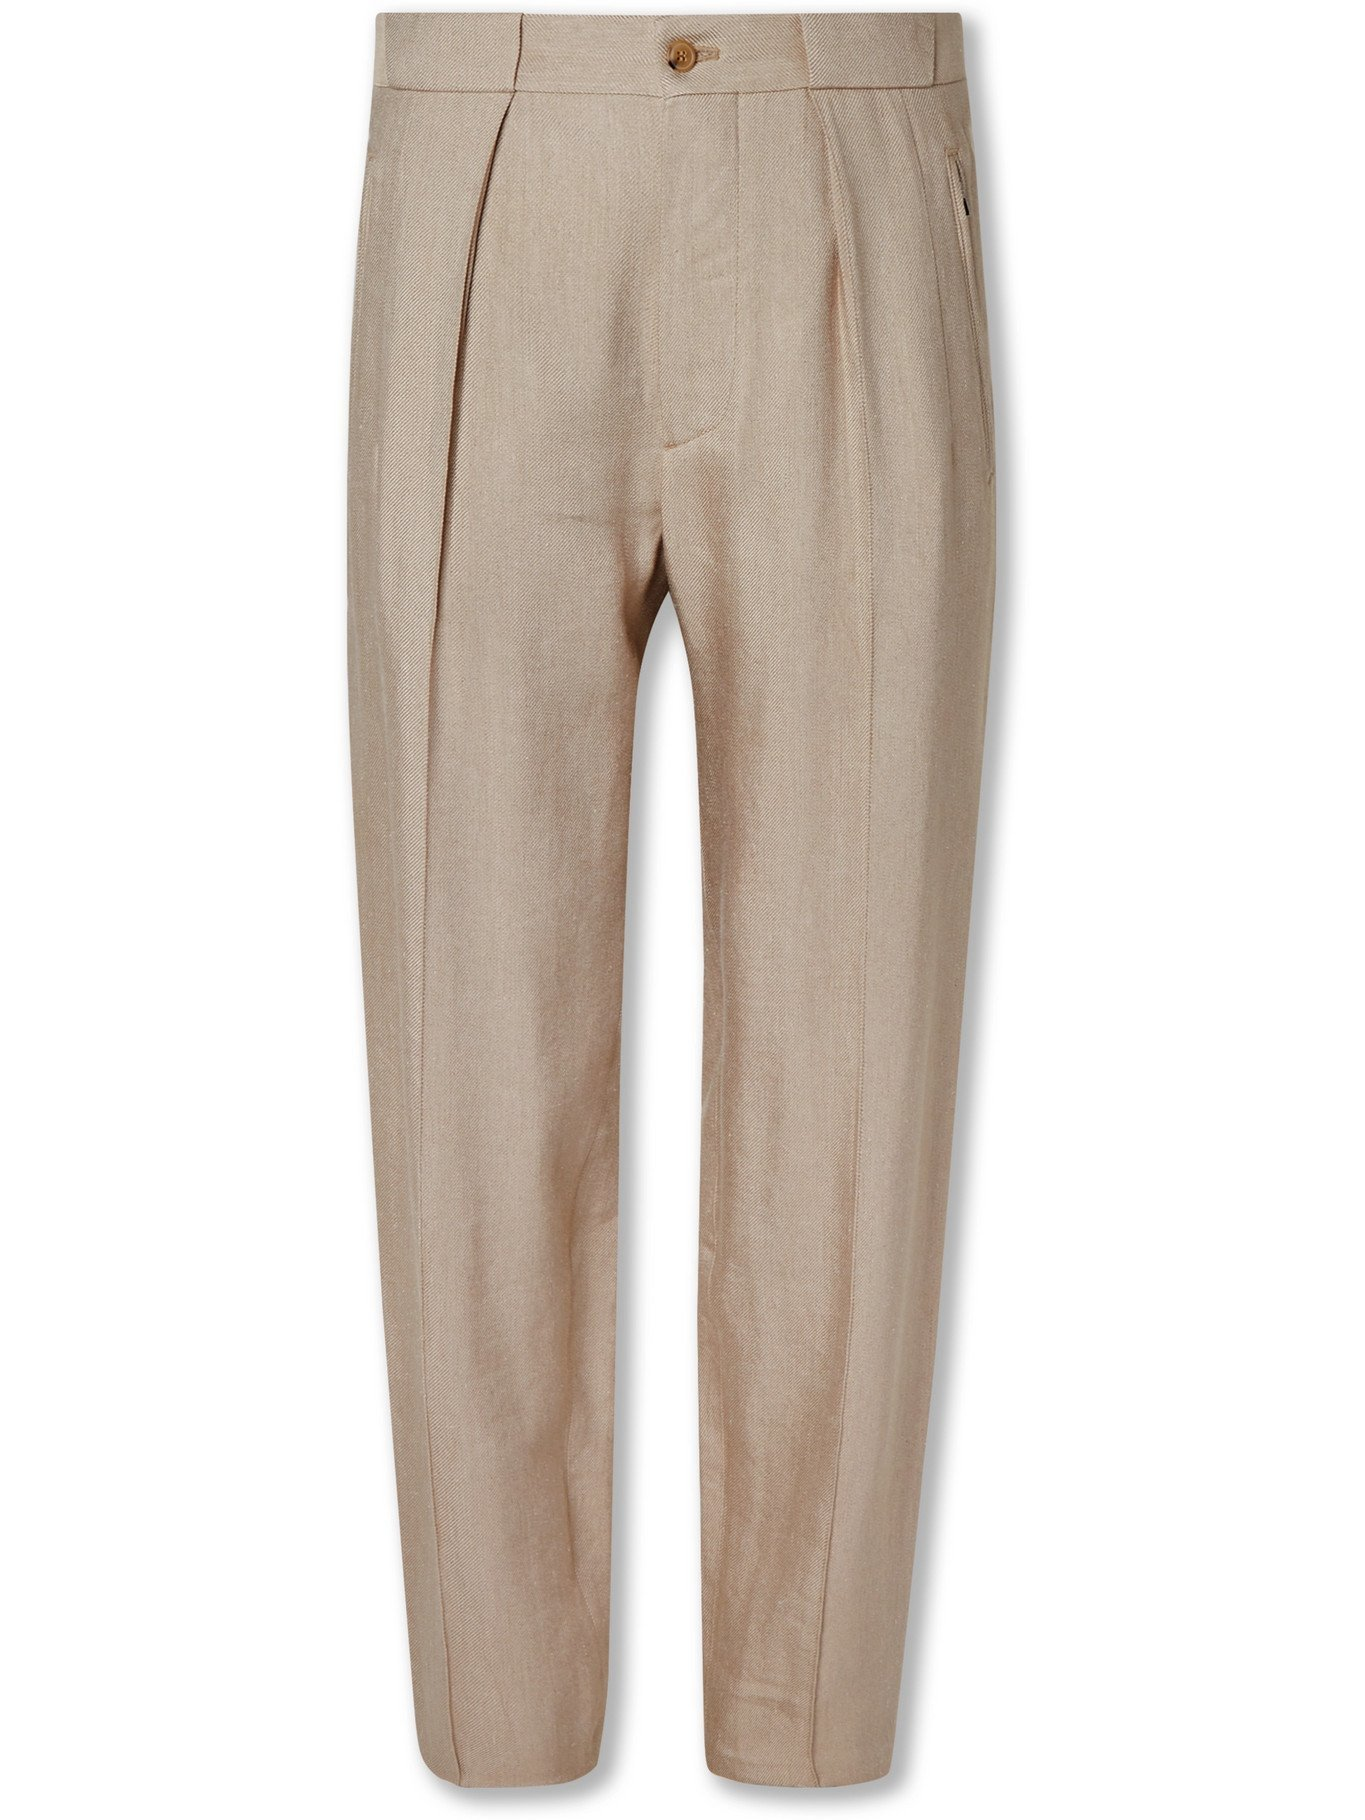 GIORGIO ARMANI - Tapered Pleated Twill Trousers - Neutrals - IT 48